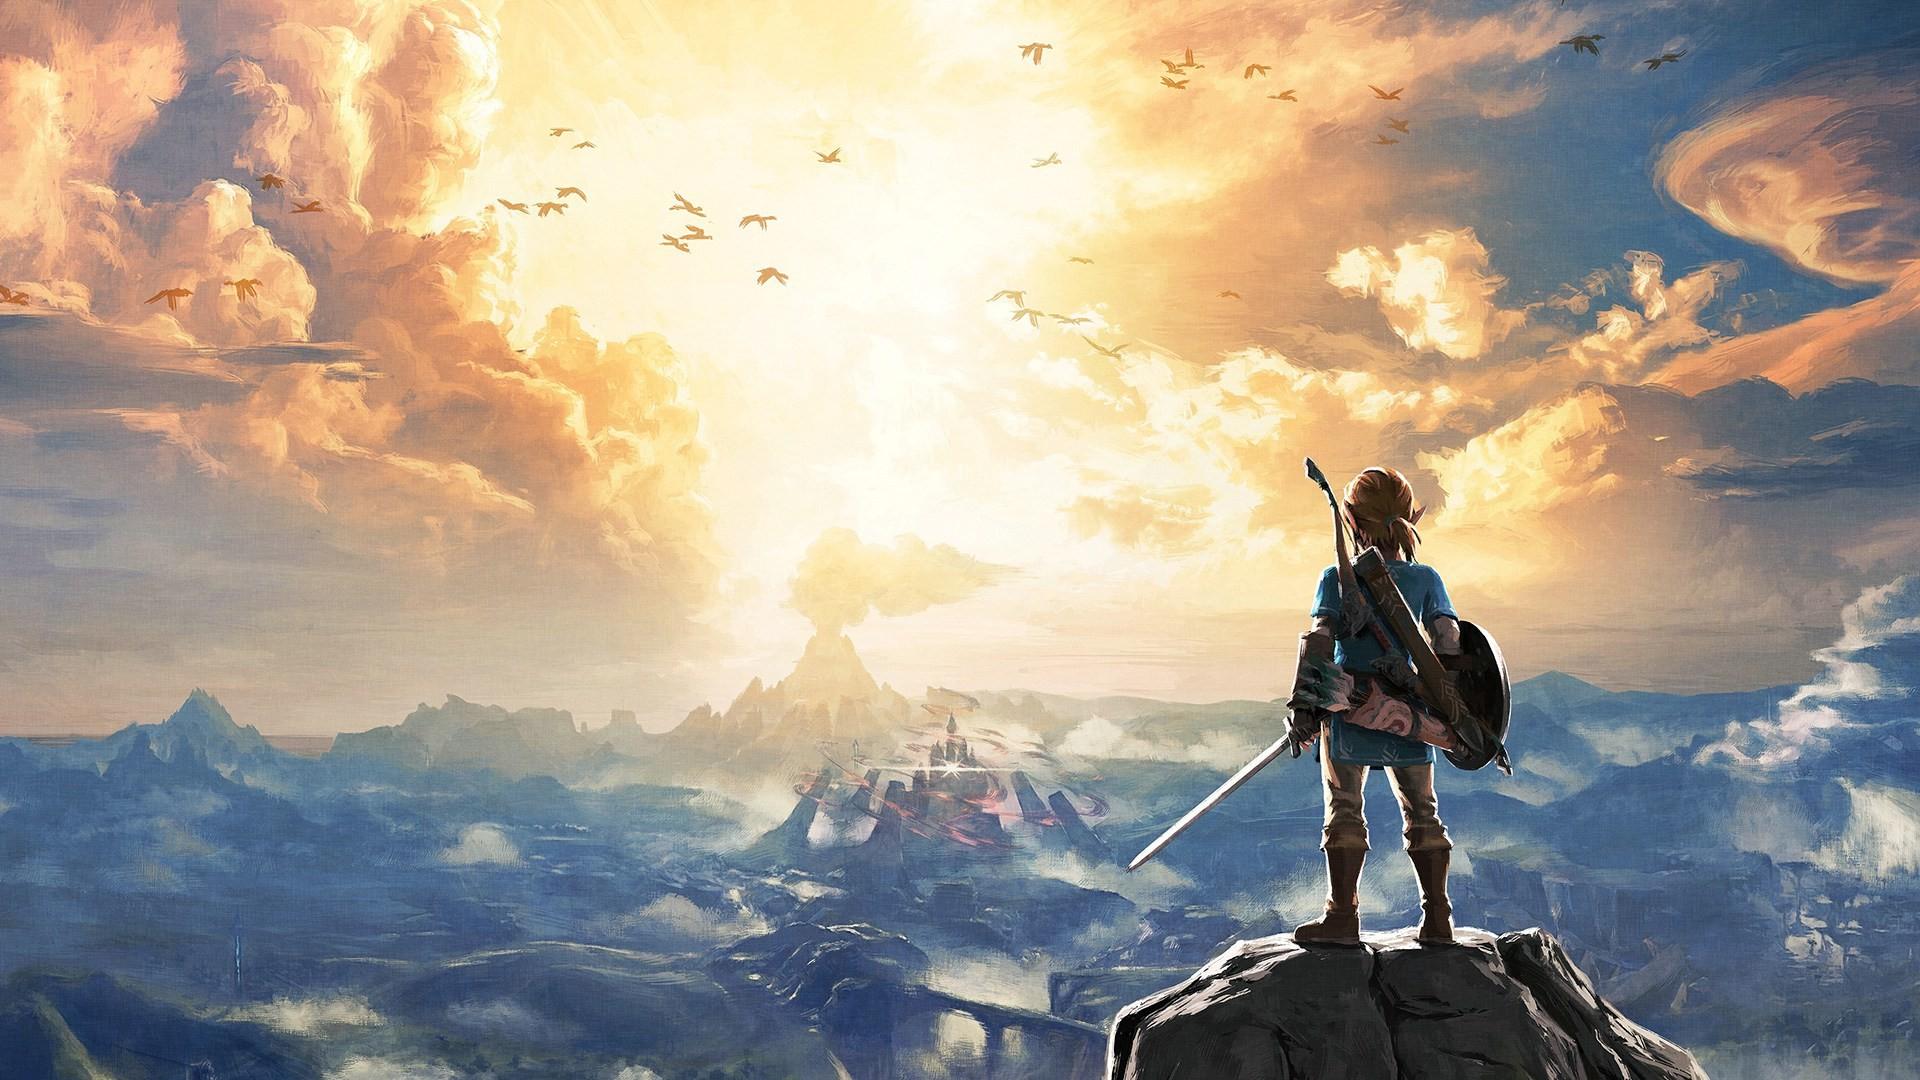 Zelda Breath Of The Wild Wallpaper Hd: Legend Of Zelda Breath Of The Wild Wallpaper ·① Download